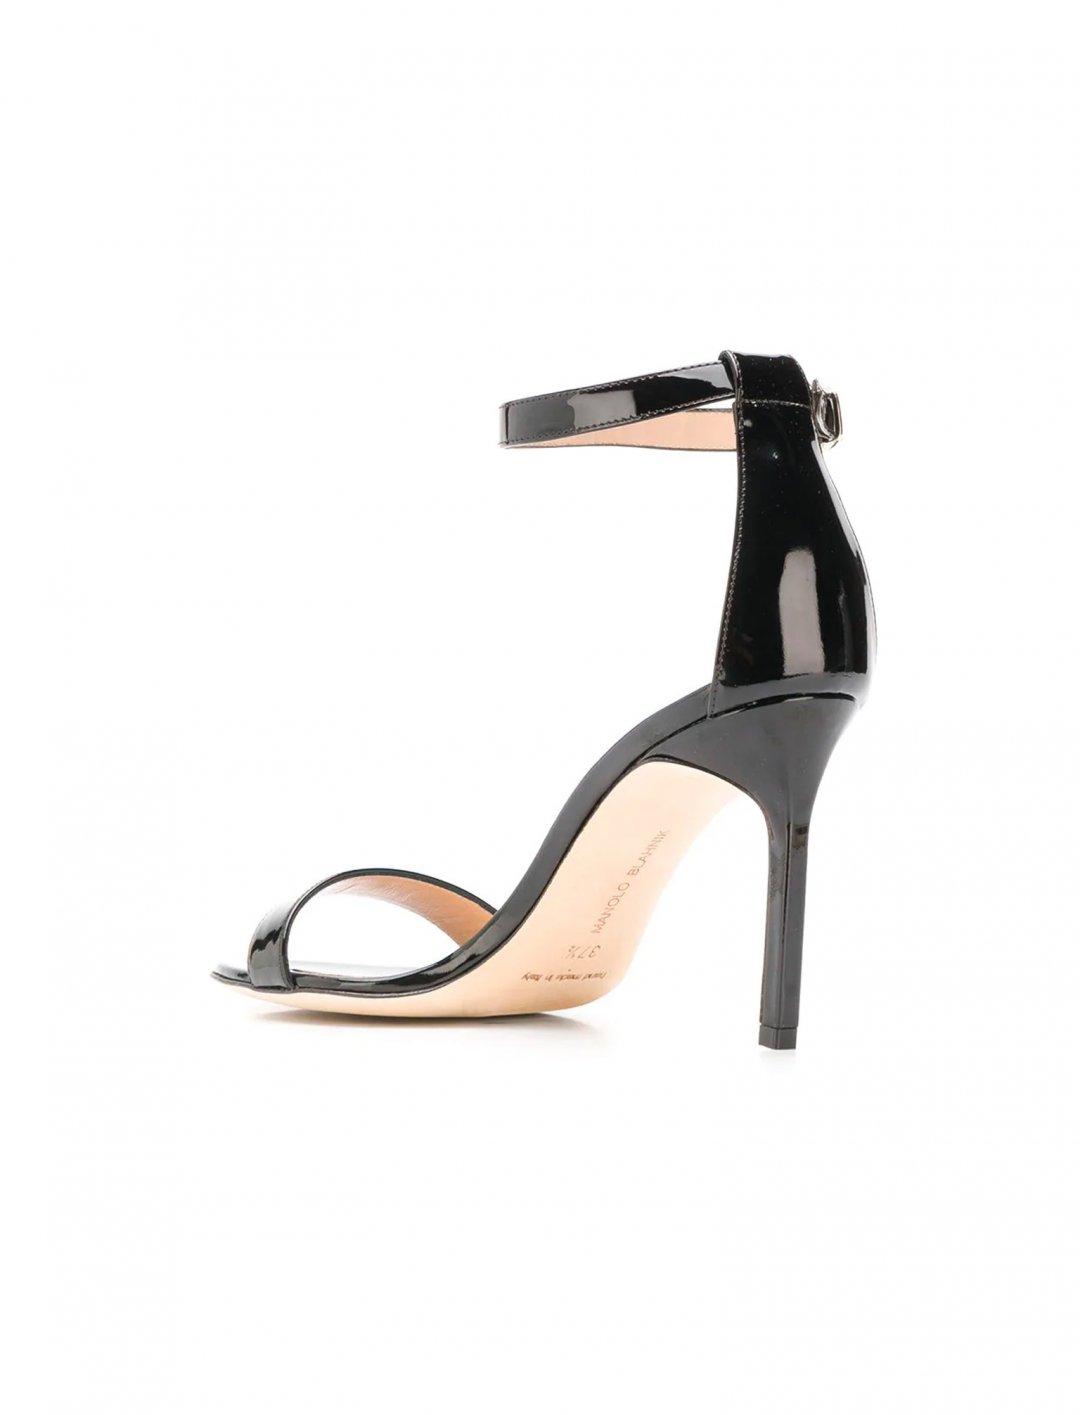 fe727f1dc9df5 Chaos Sandals Shoes Manolo Blahnik Chaos Sandals Shoes Manolo Blahnik ...